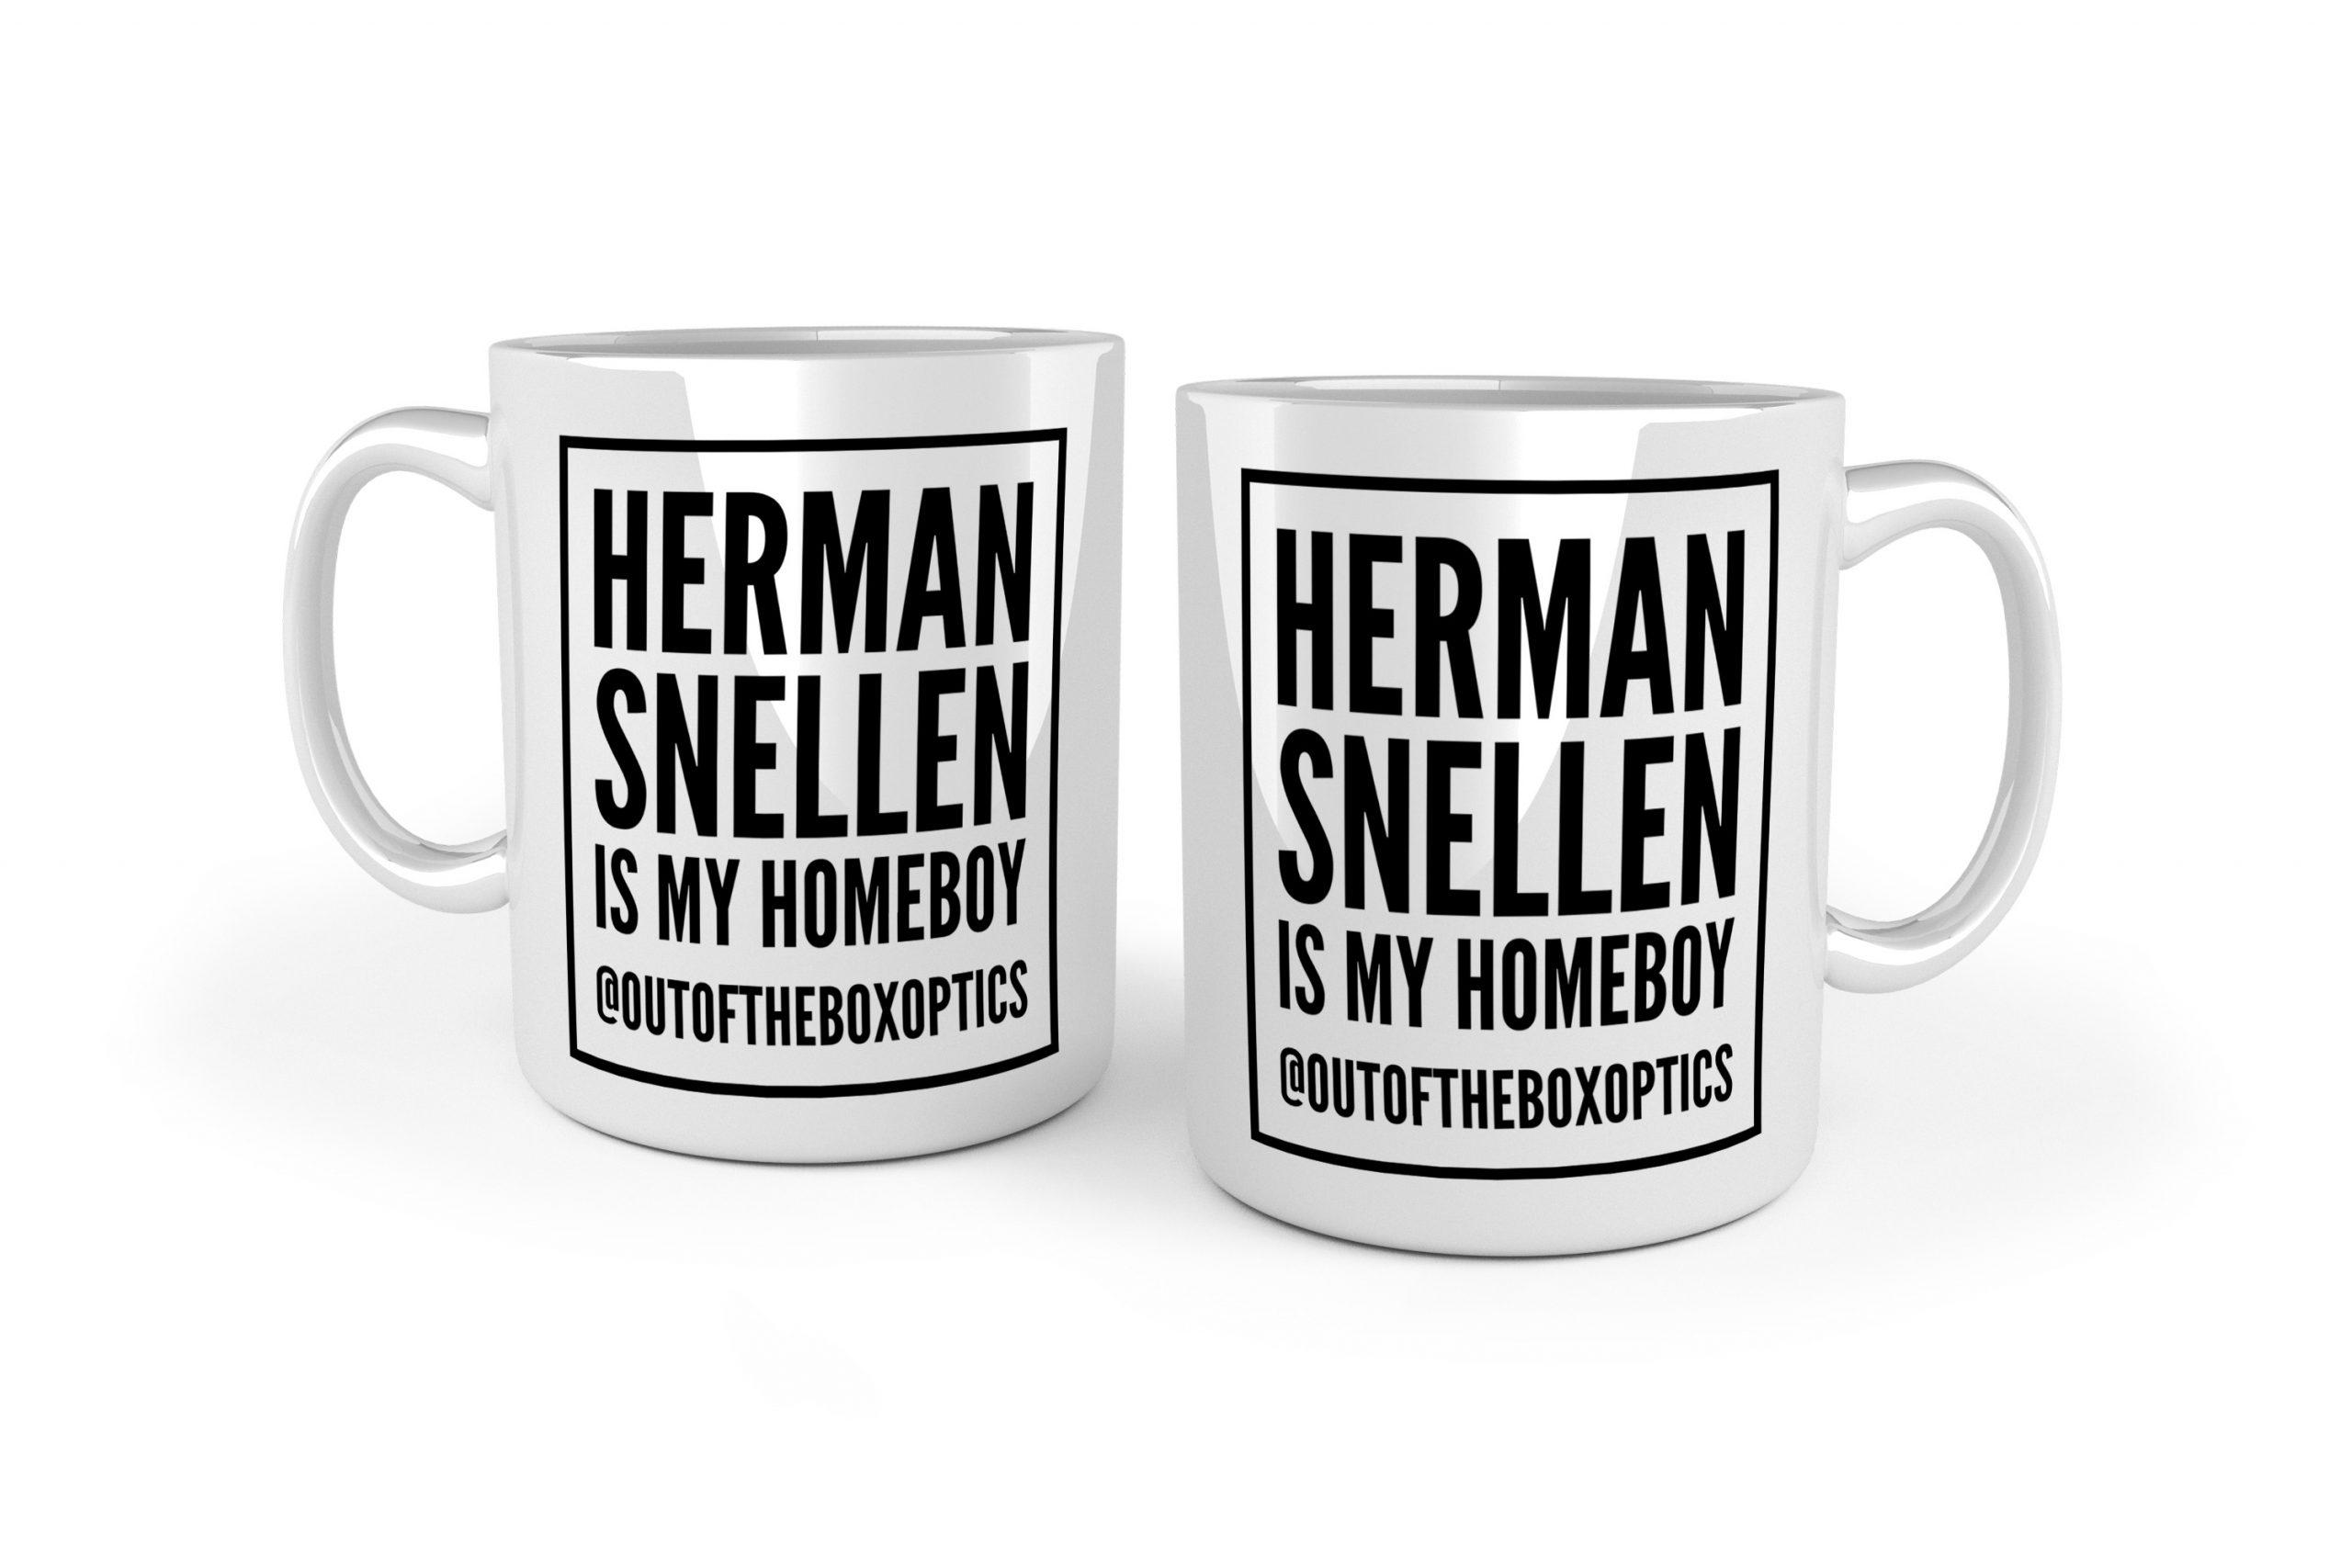 Herman Snellen Is My Homeboy – White Ceramic Mug